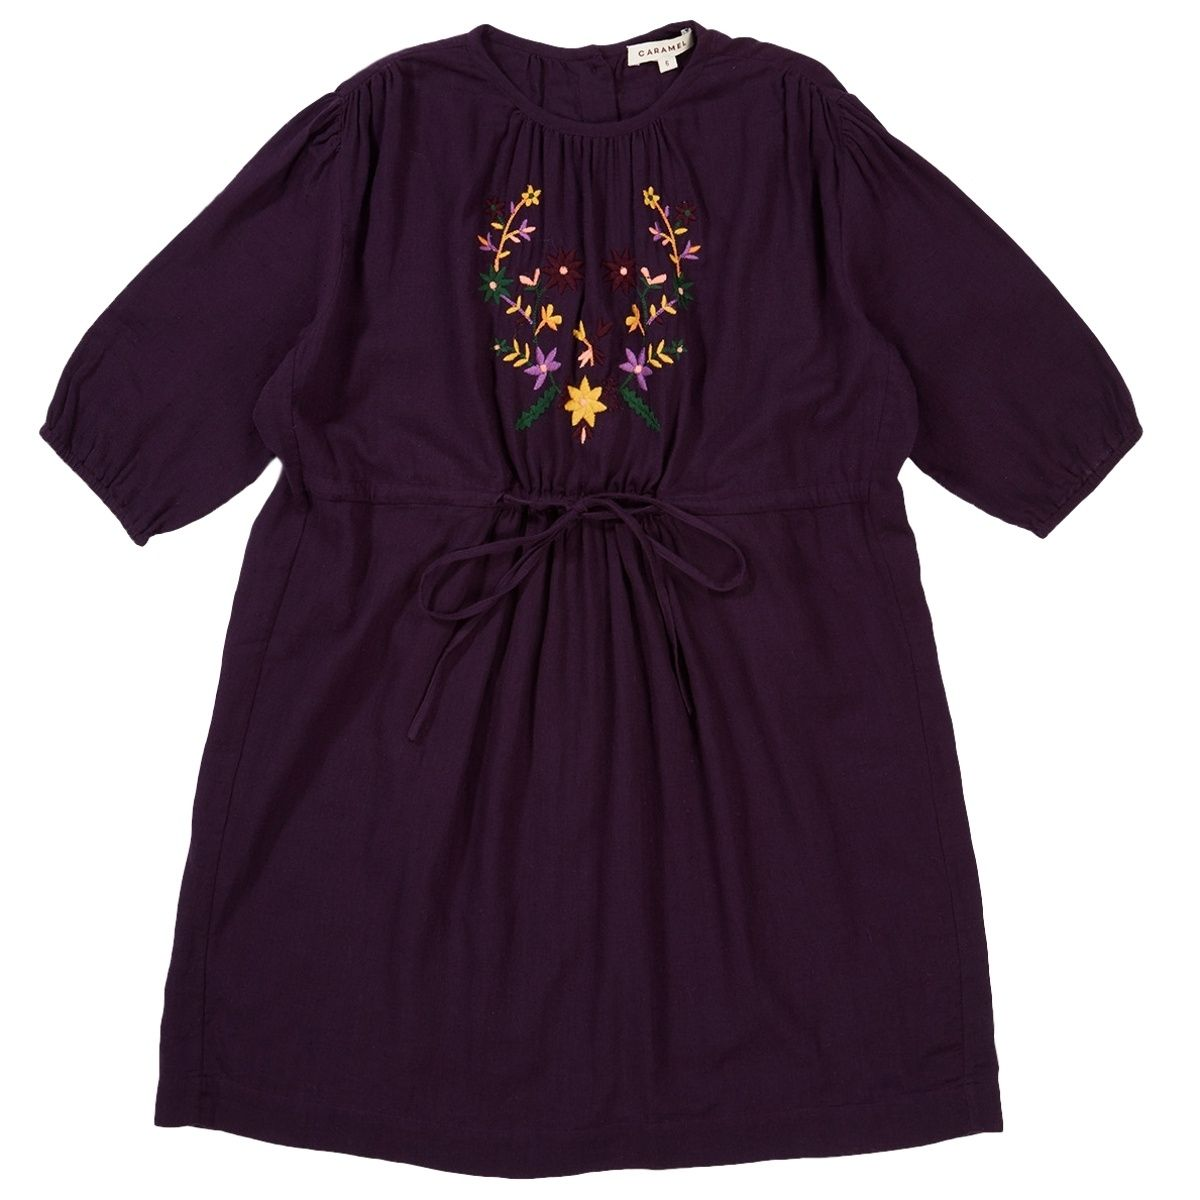 Caramel Baby & Child - Phoebe Dress purple - 1